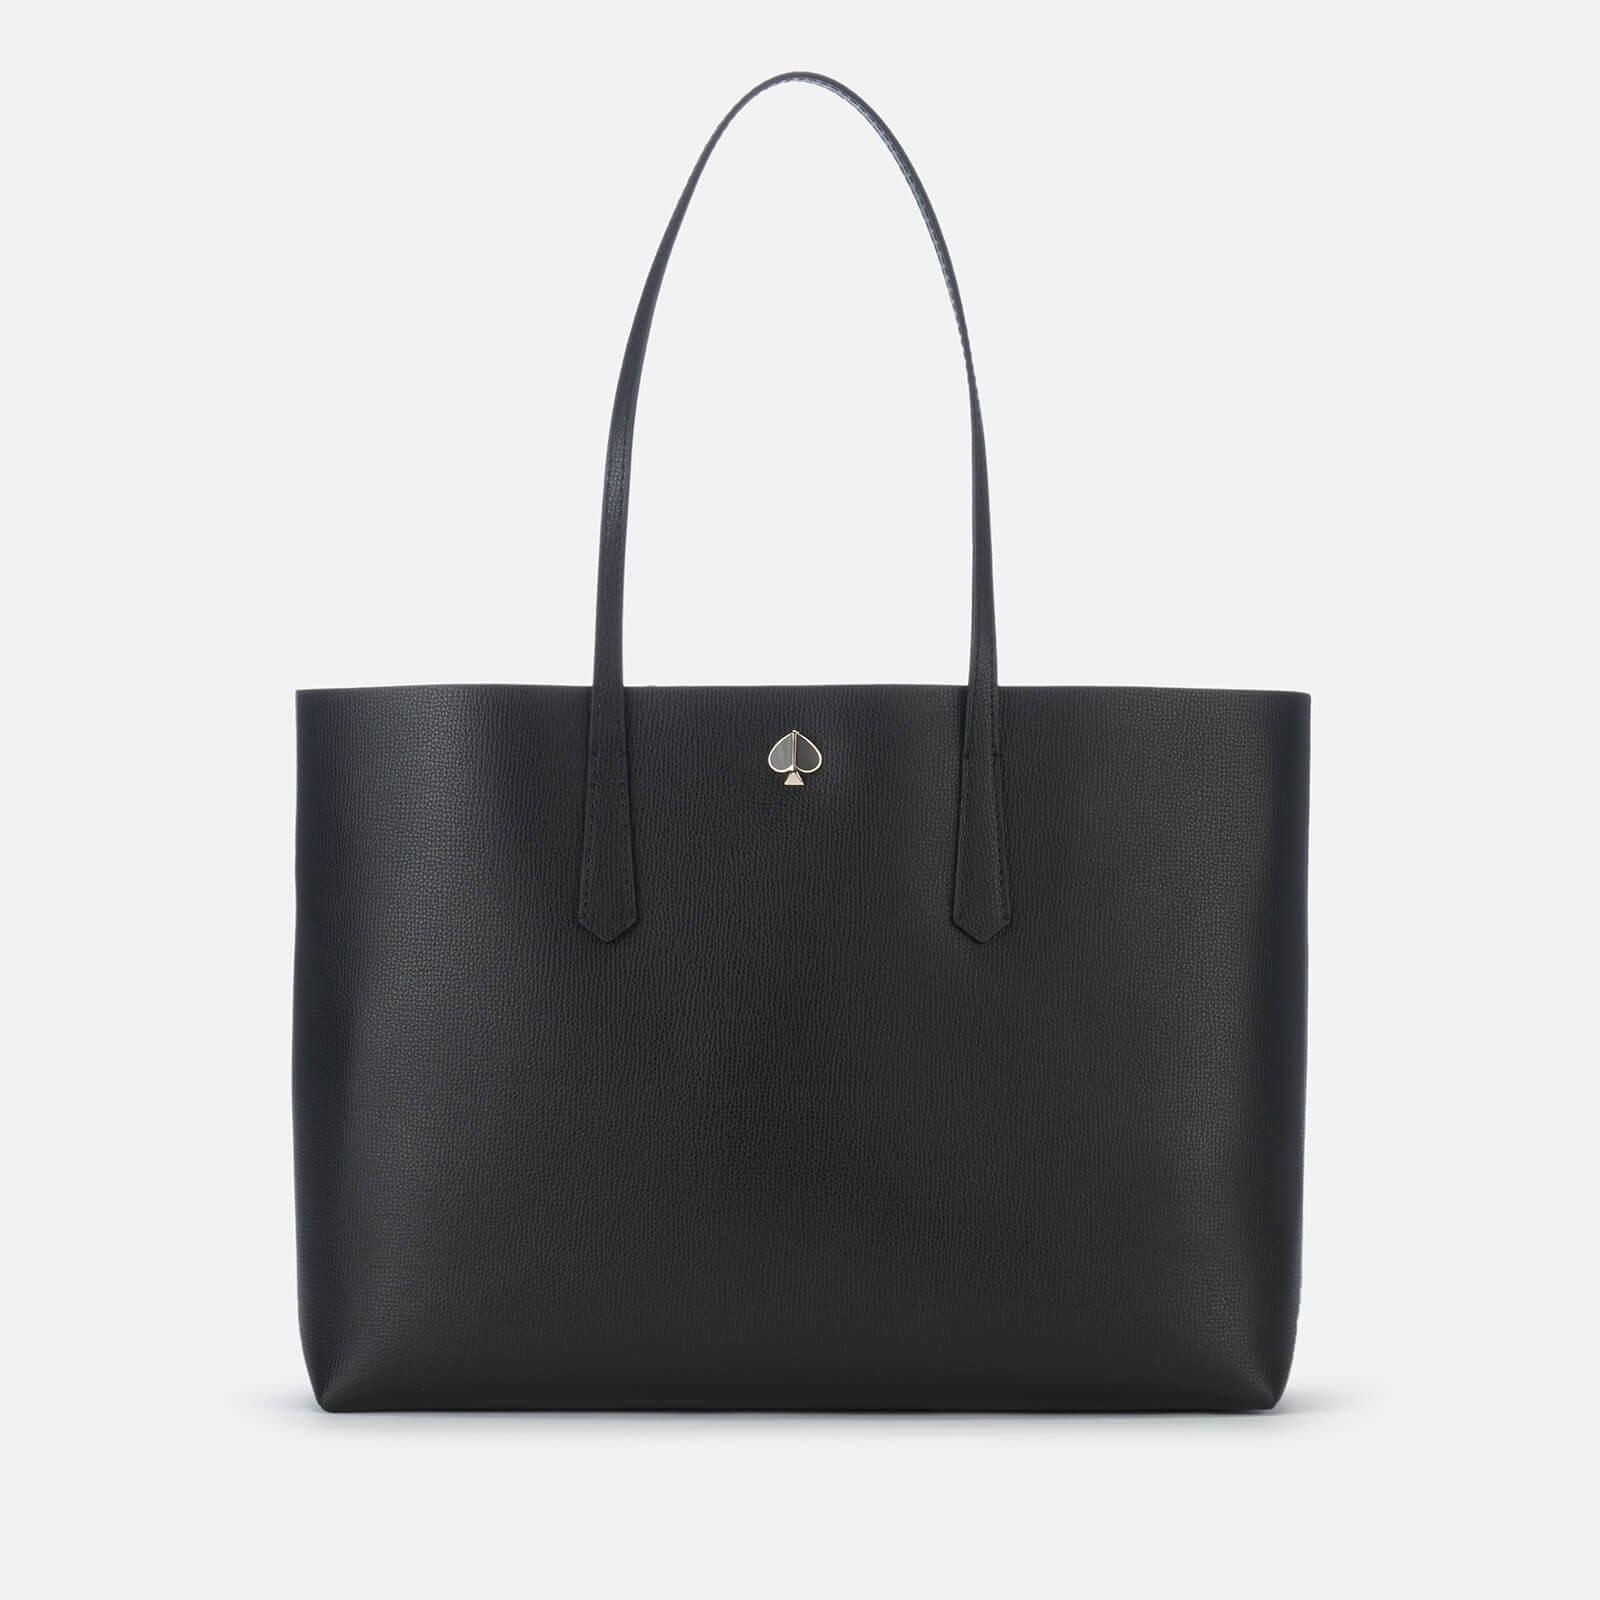 7f659faf Kate Spade New York Women's Molly Large Tote Bag - Black